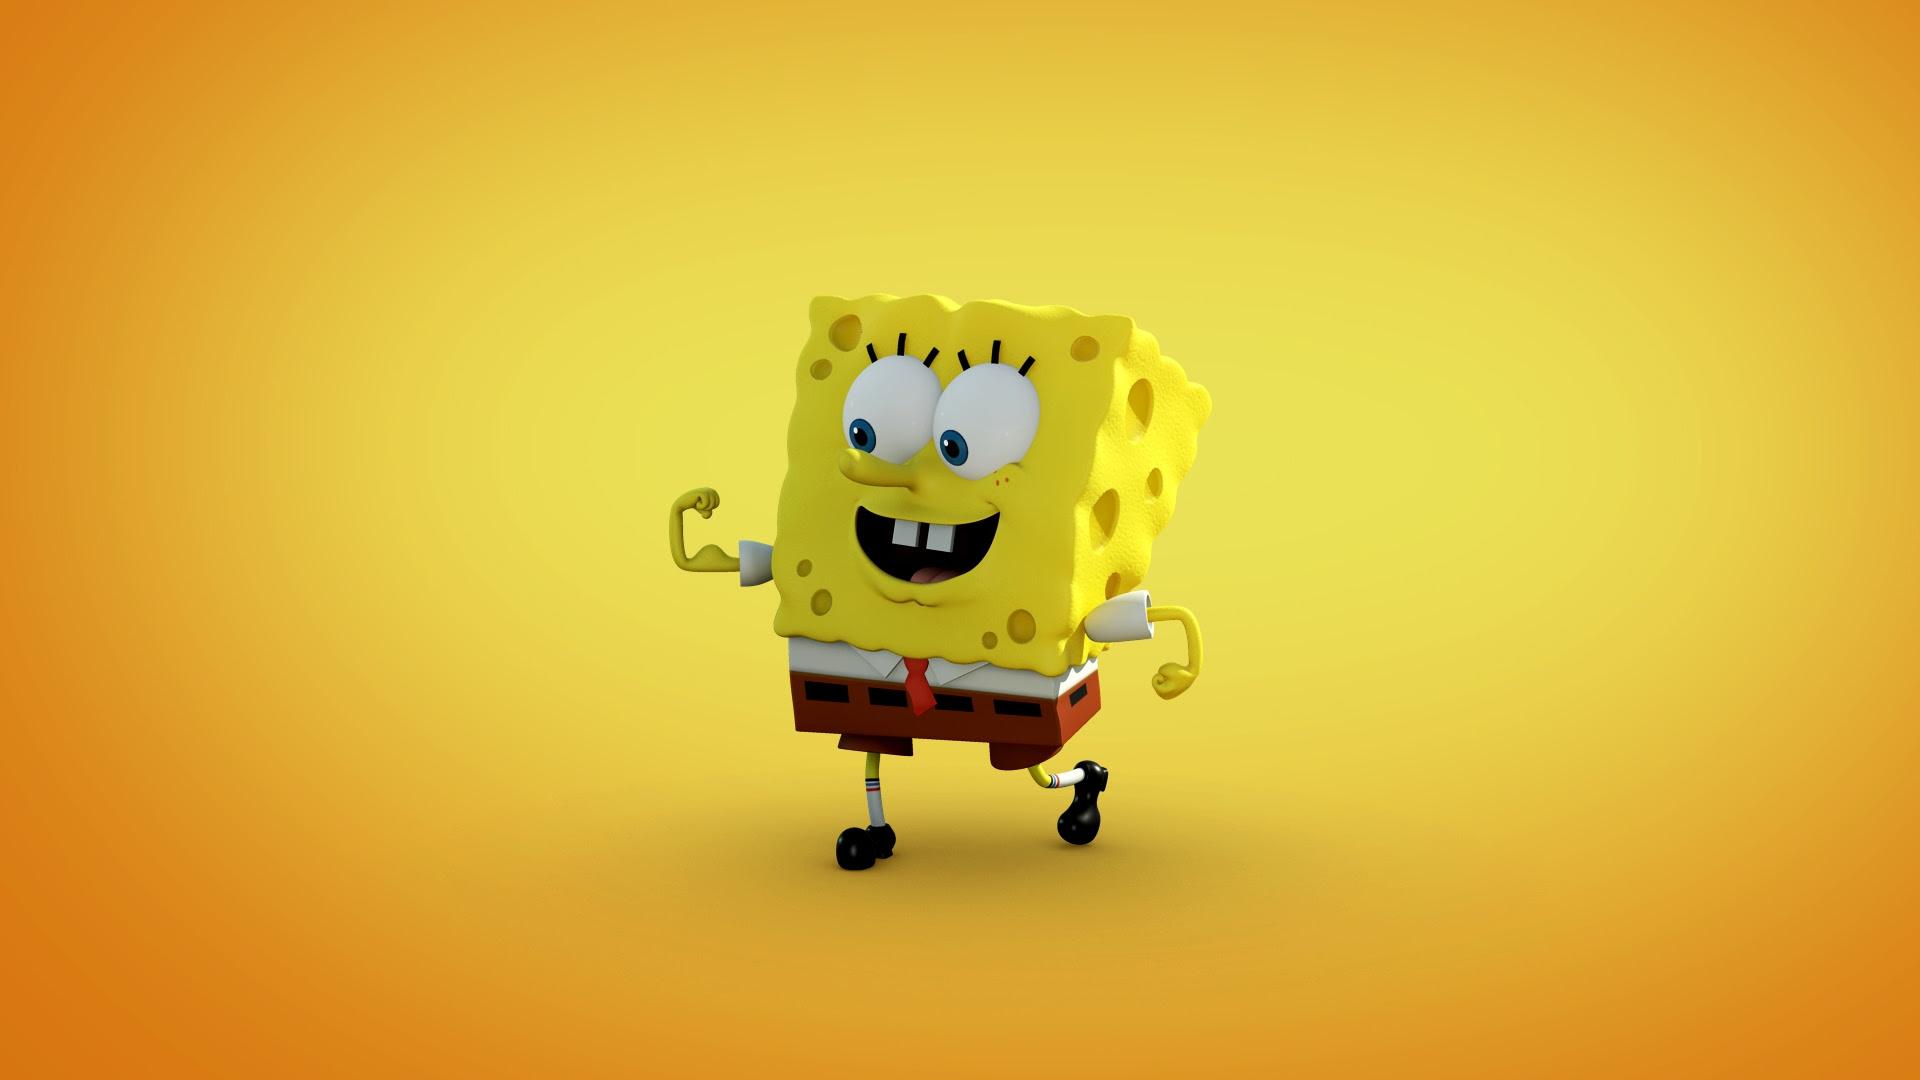 Spongebob Squarepants Images Spongebob Hd Wallpaper And Background